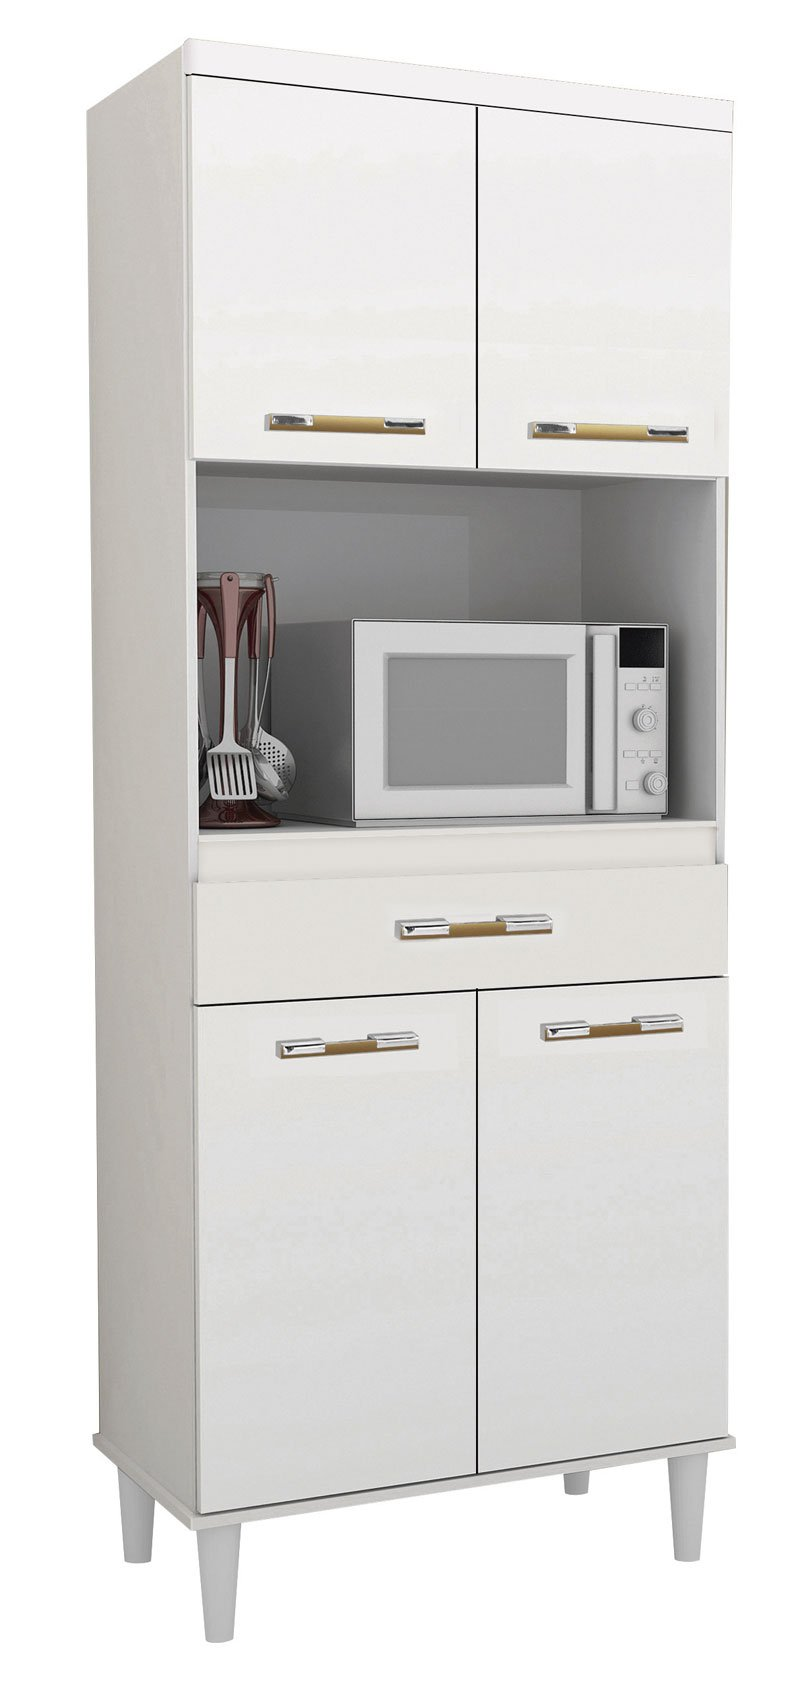 Armário de Cozinha Vilage 0,70m Branco Brilho - Trinobél Móveis